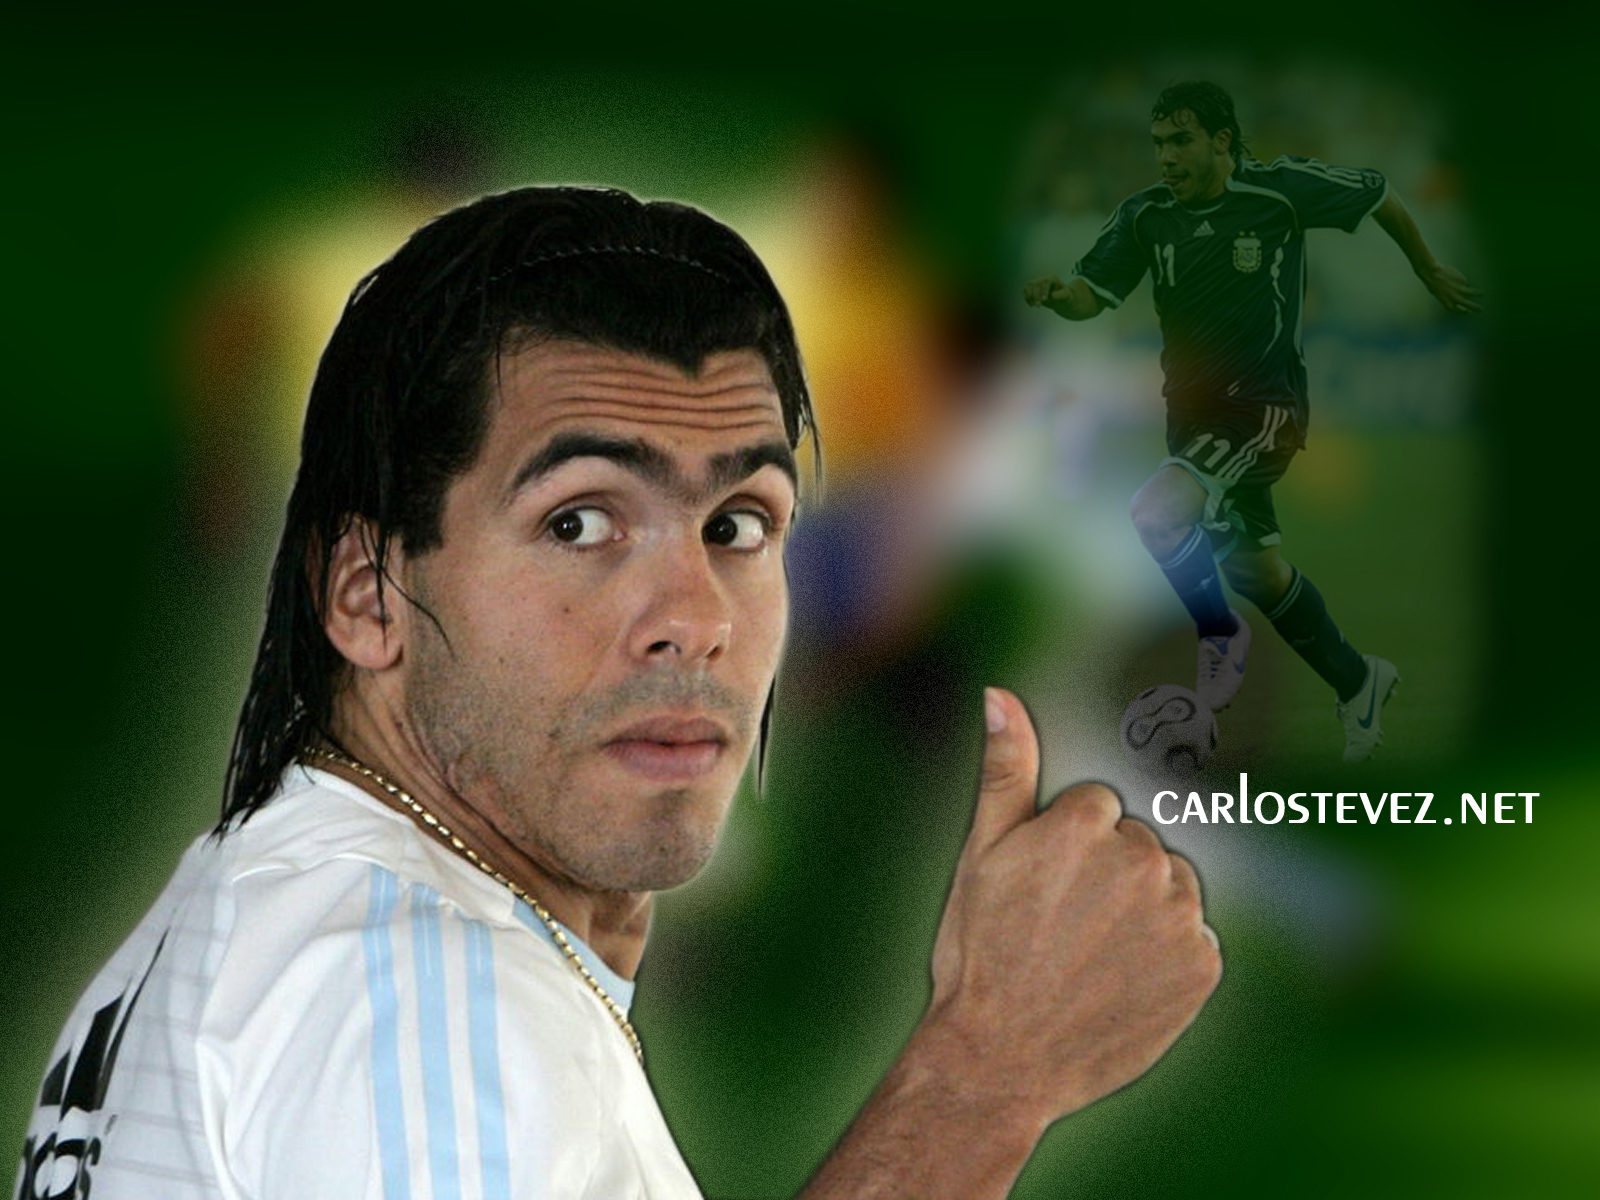 http://4.bp.blogspot.com/-NGcyBRDw1OQ/Te92Jgg20eI/AAAAAAAACCI/8ElK1iZPkIc/s1600/Carlos-Tevez-Wallpaper-2.jpg